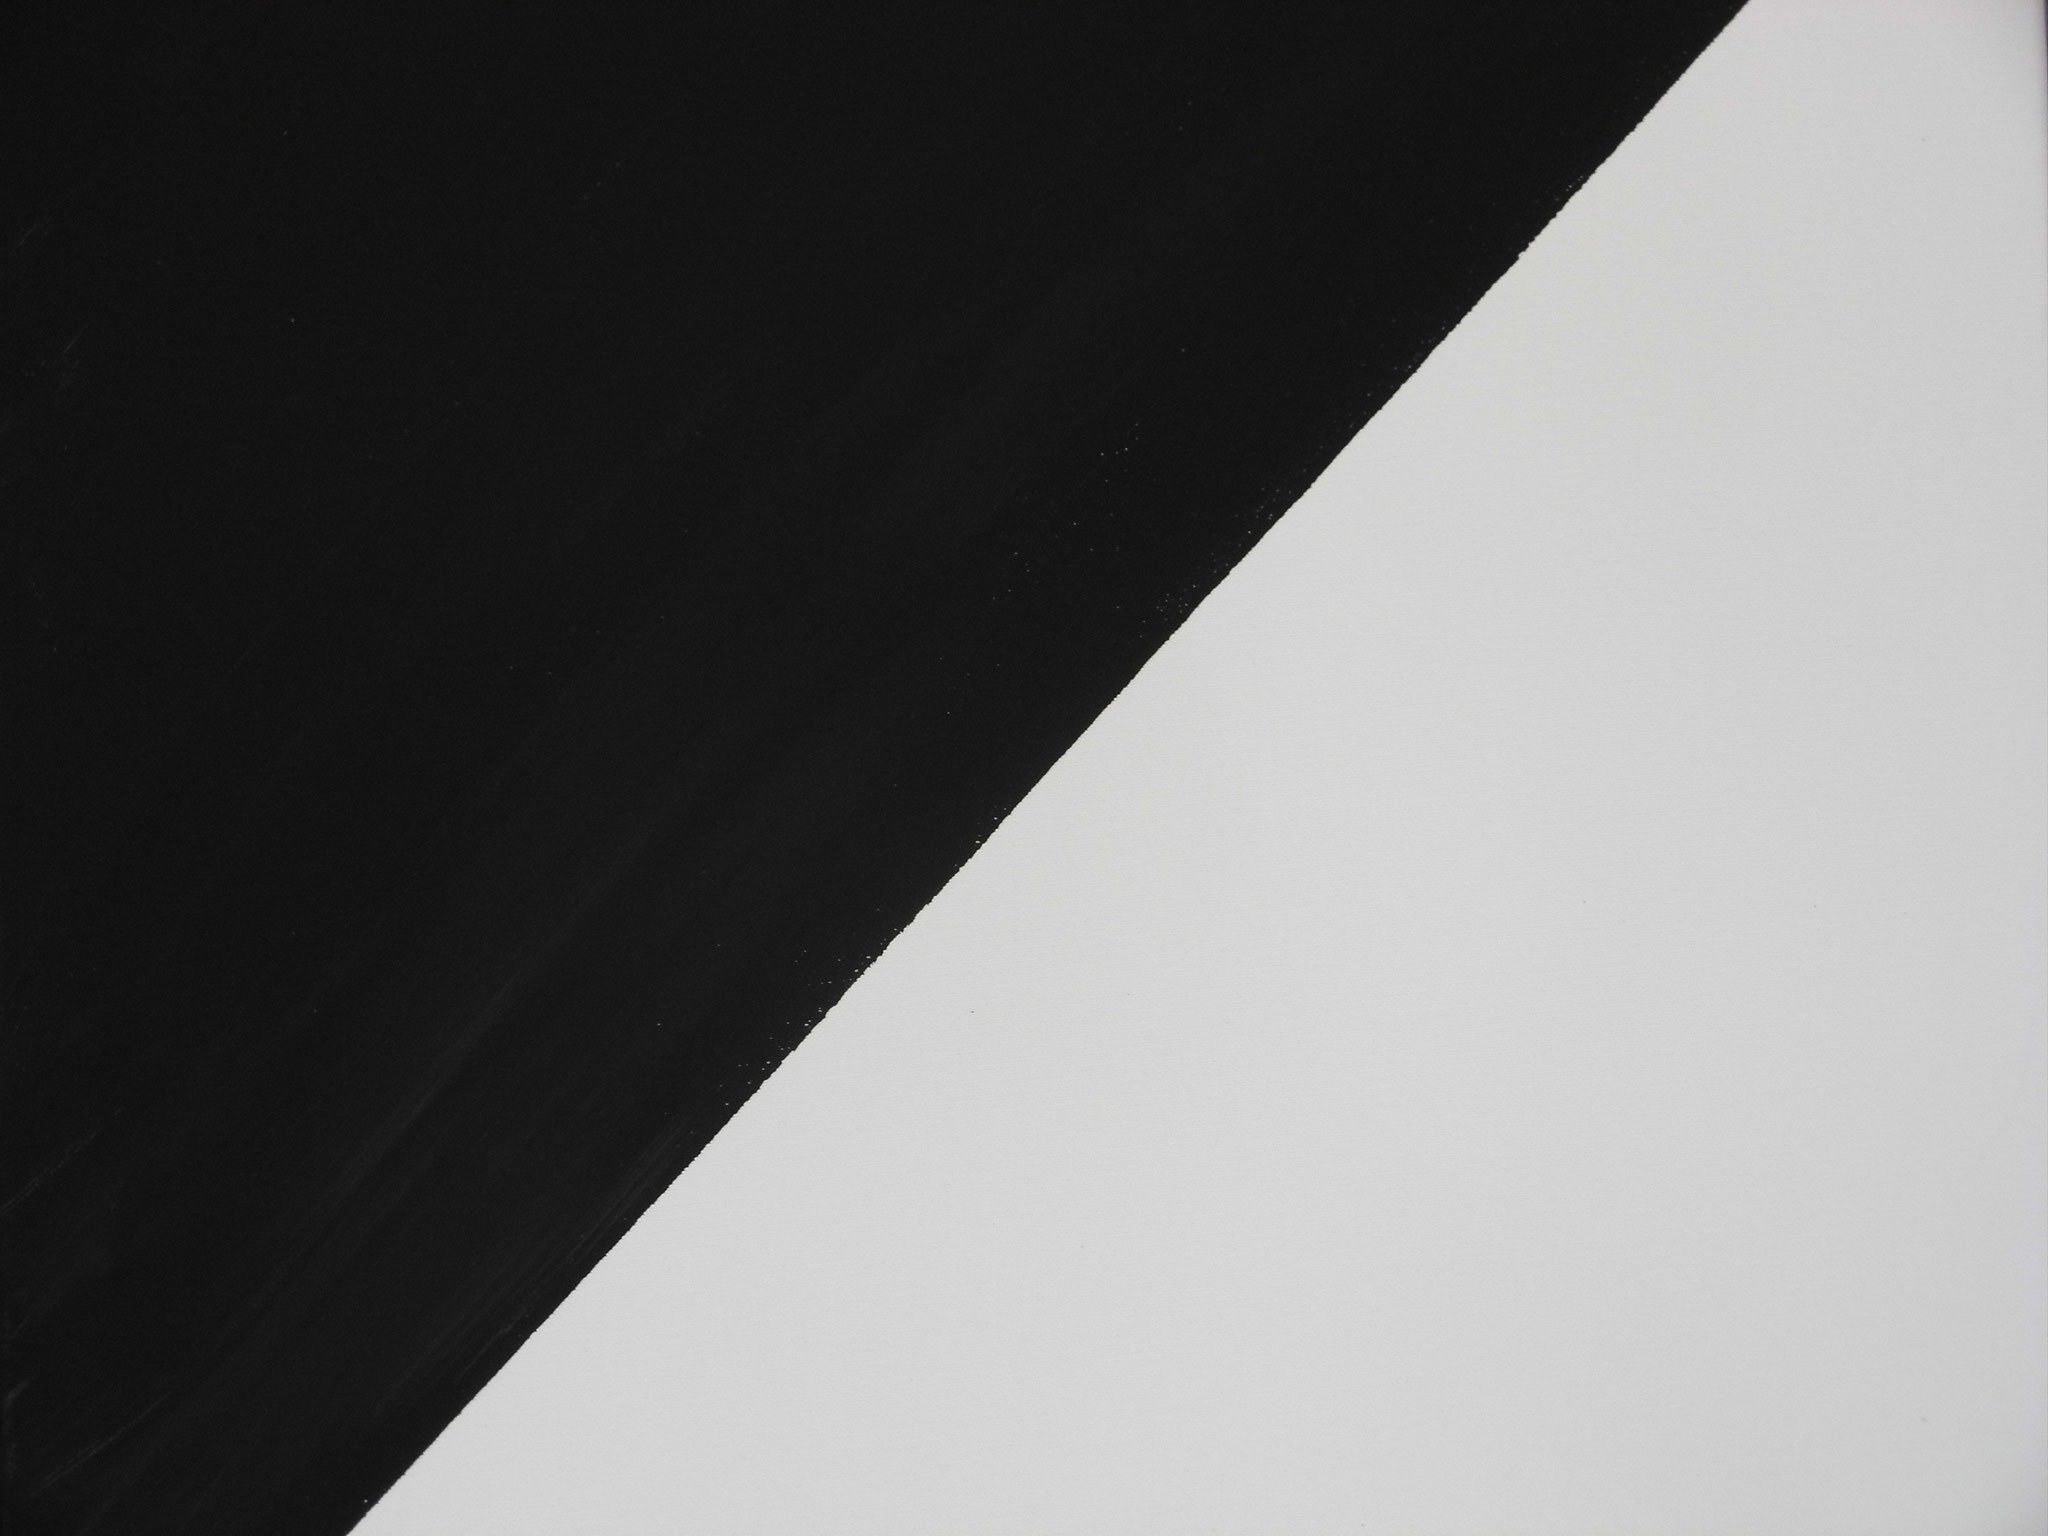 Bild-Nr. 250  o. T. ©  Maß 50 x 50  Acryl/Leinwand auf Keilrahmen